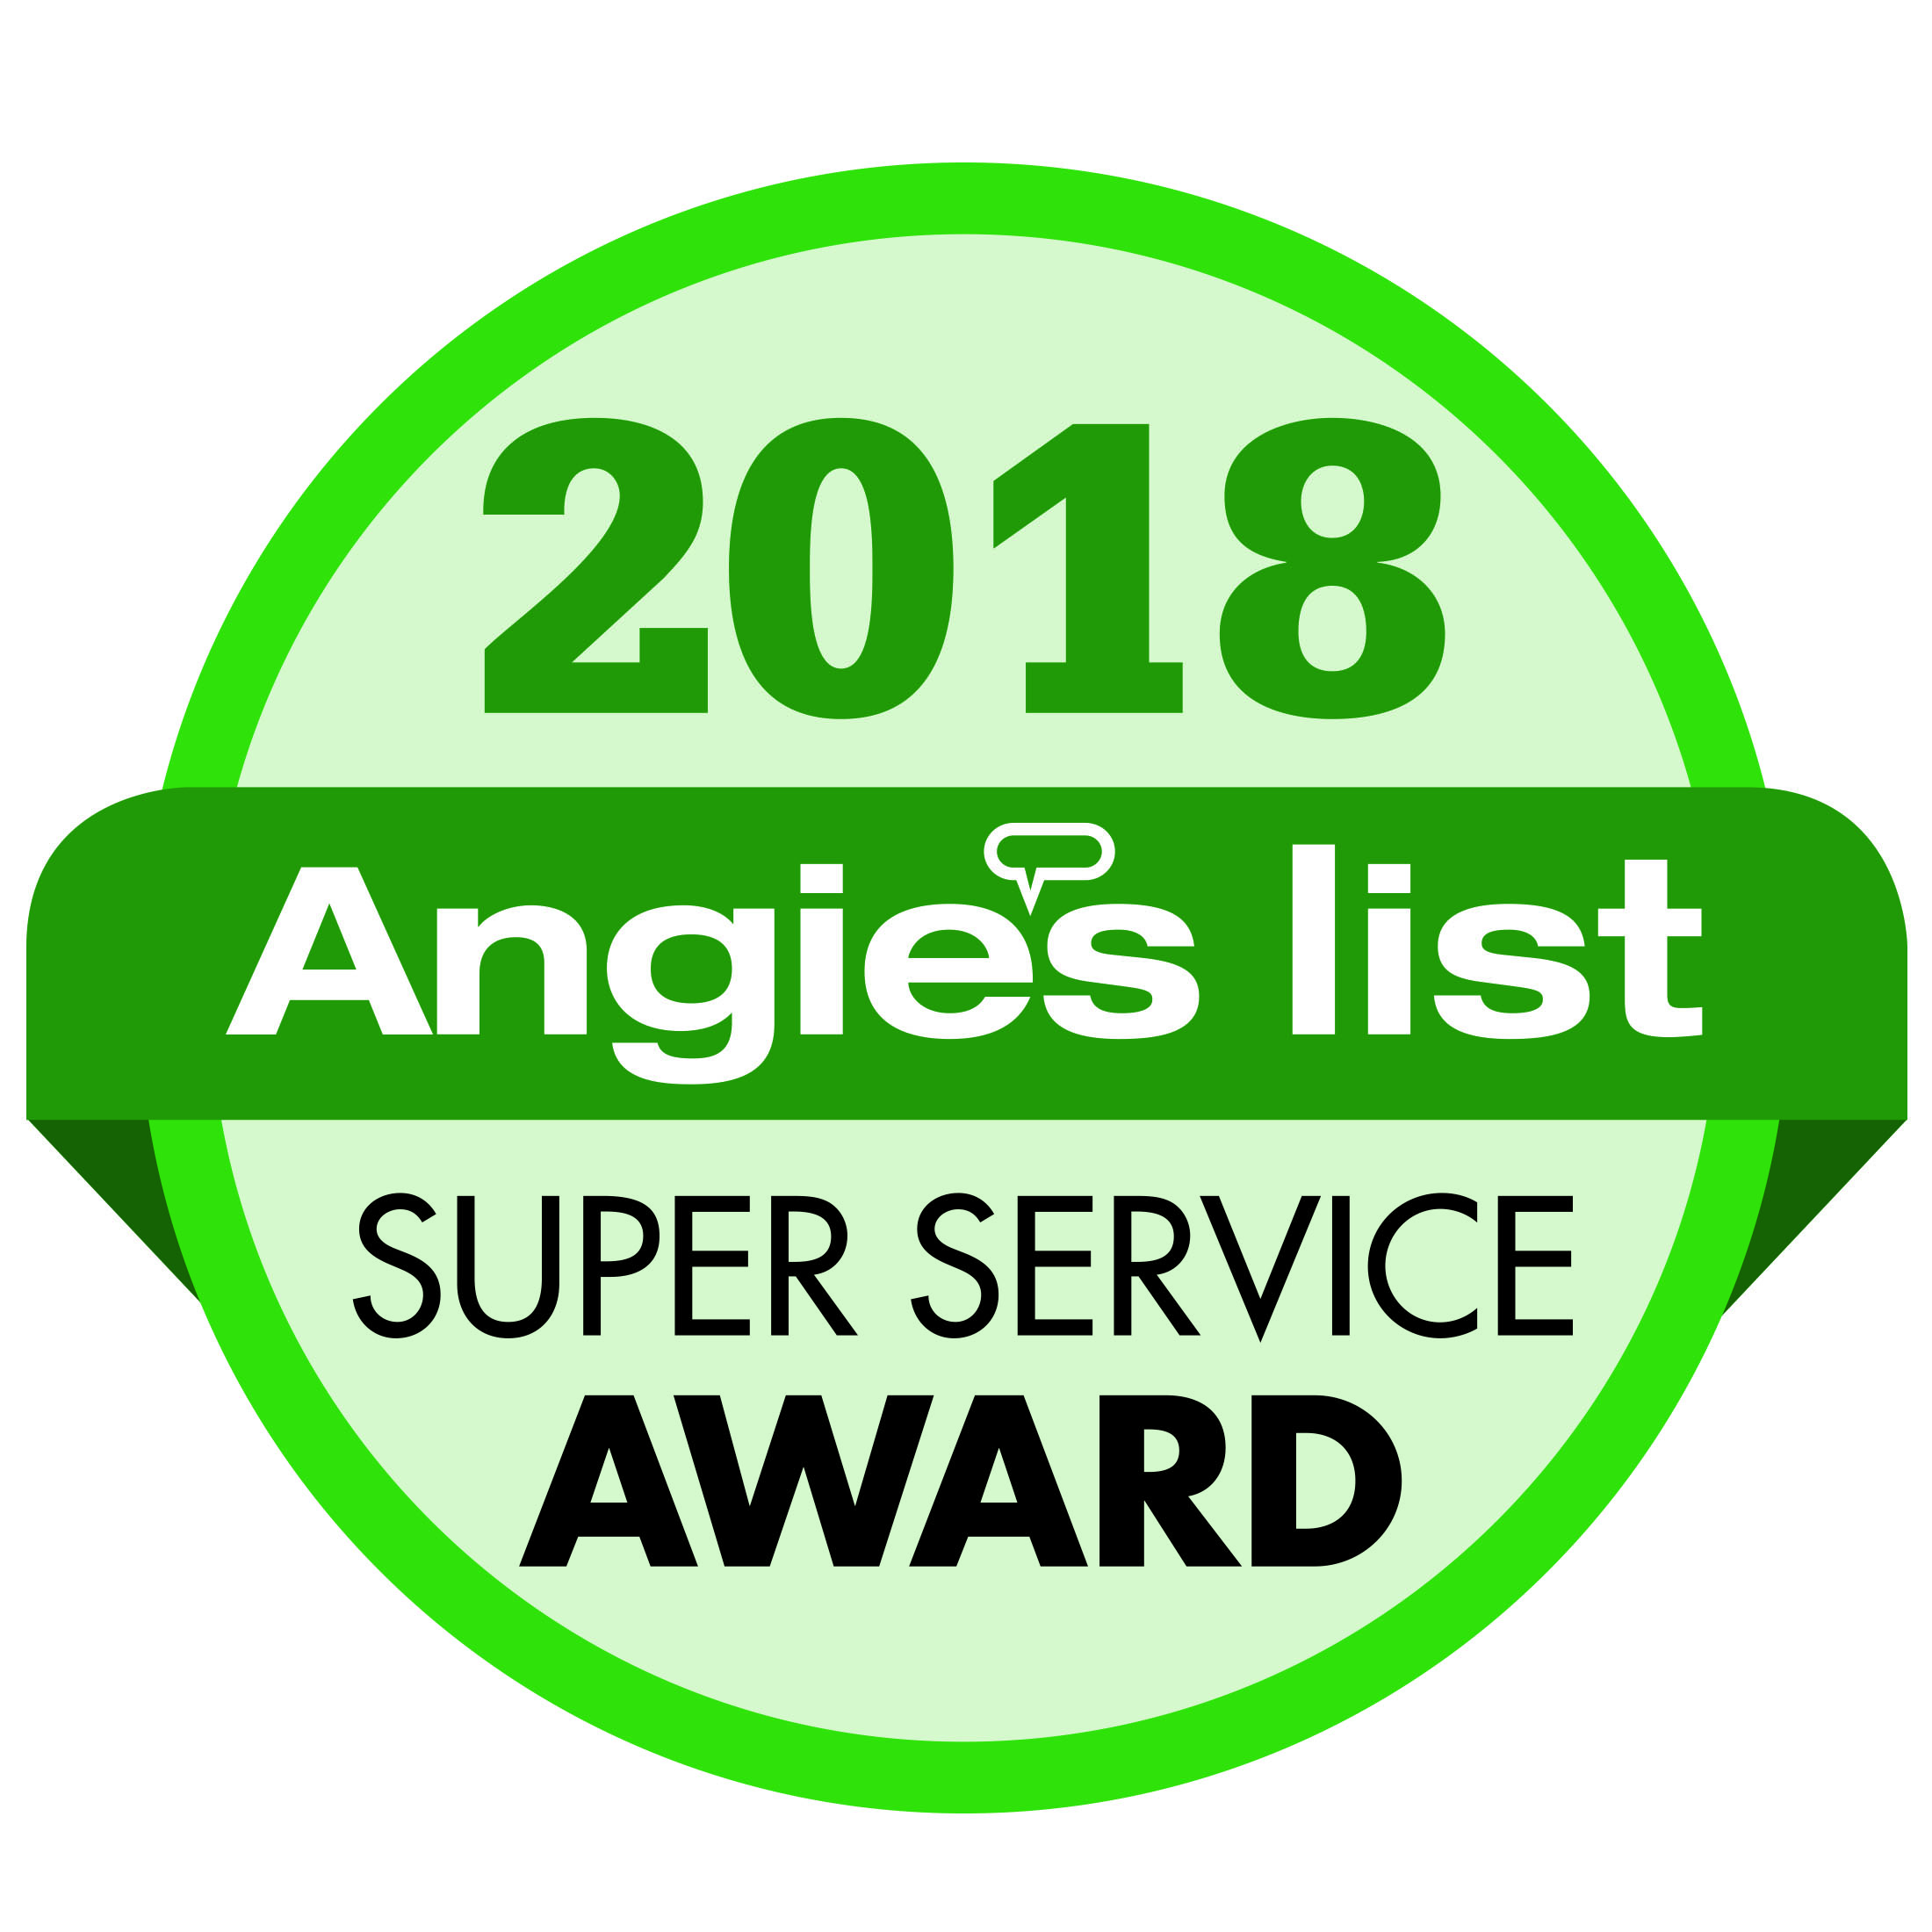 Angie's List Super Service Award Winner for 2018.